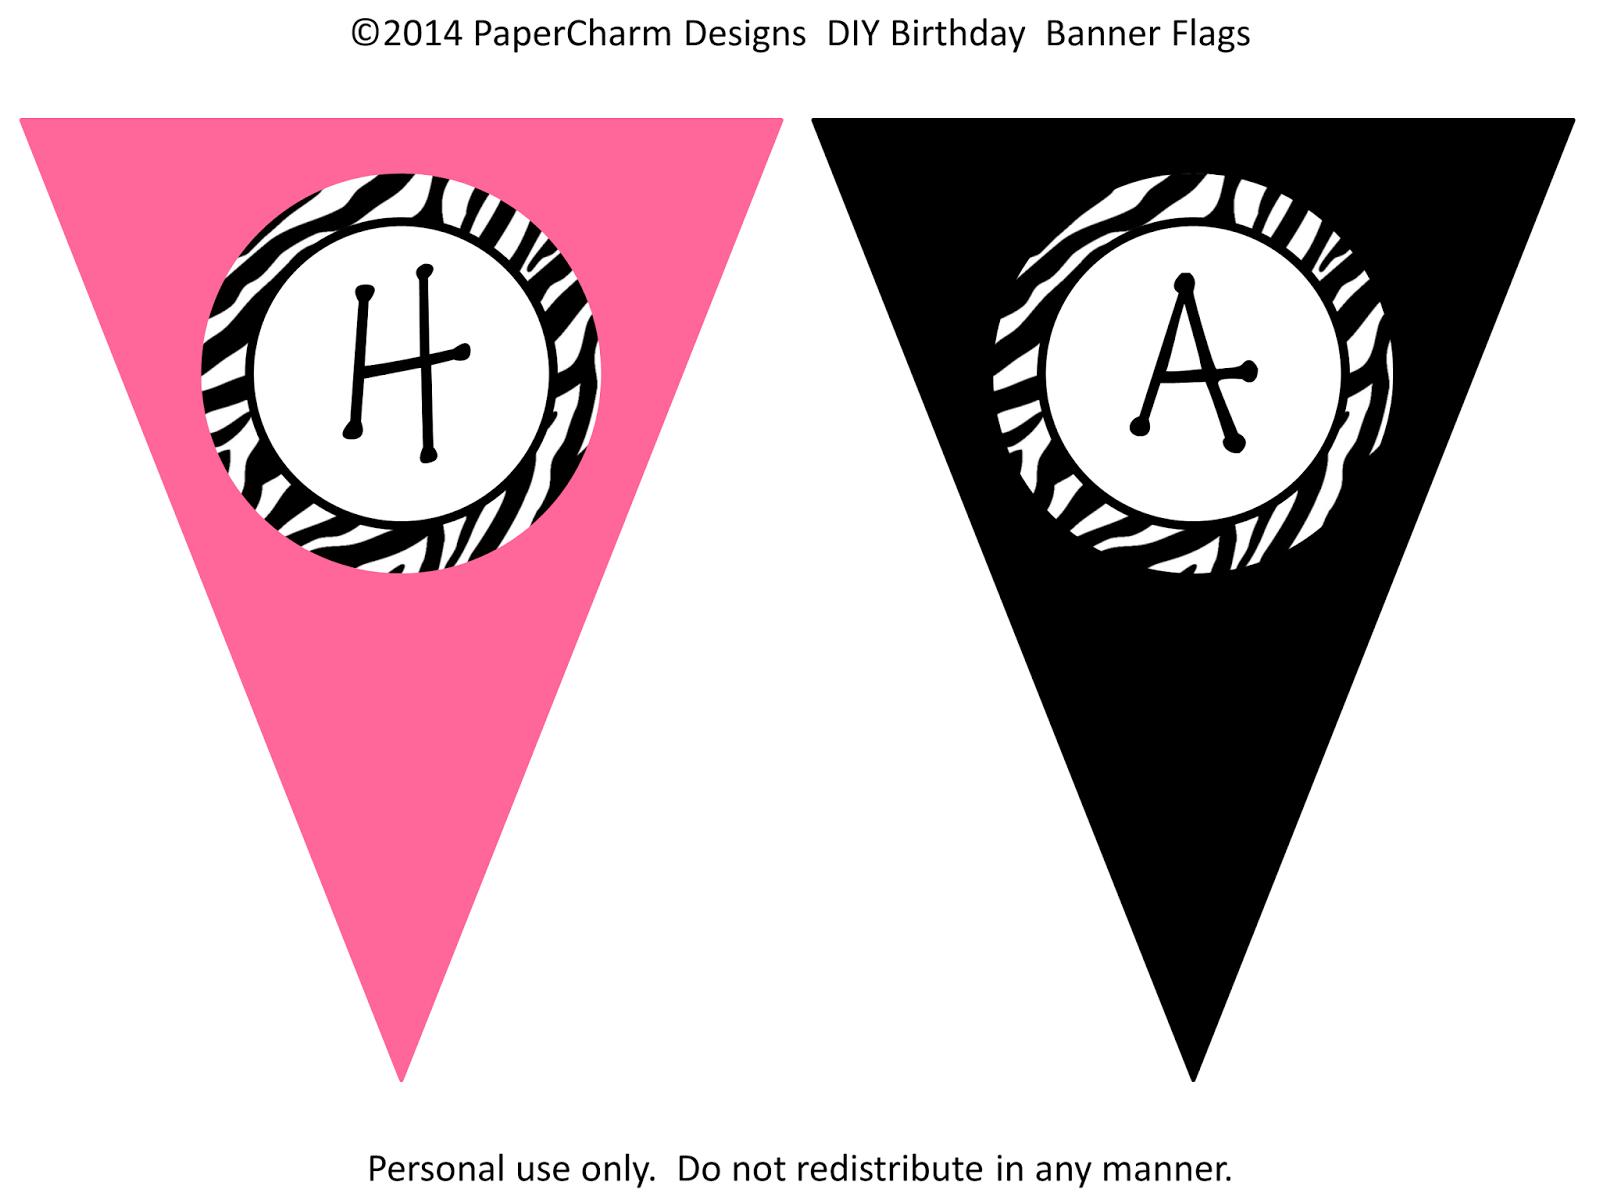 Free Printable Happy Birthday Banner Templates | Hunecompany - Free Printable Happy Birthday Banner Templates